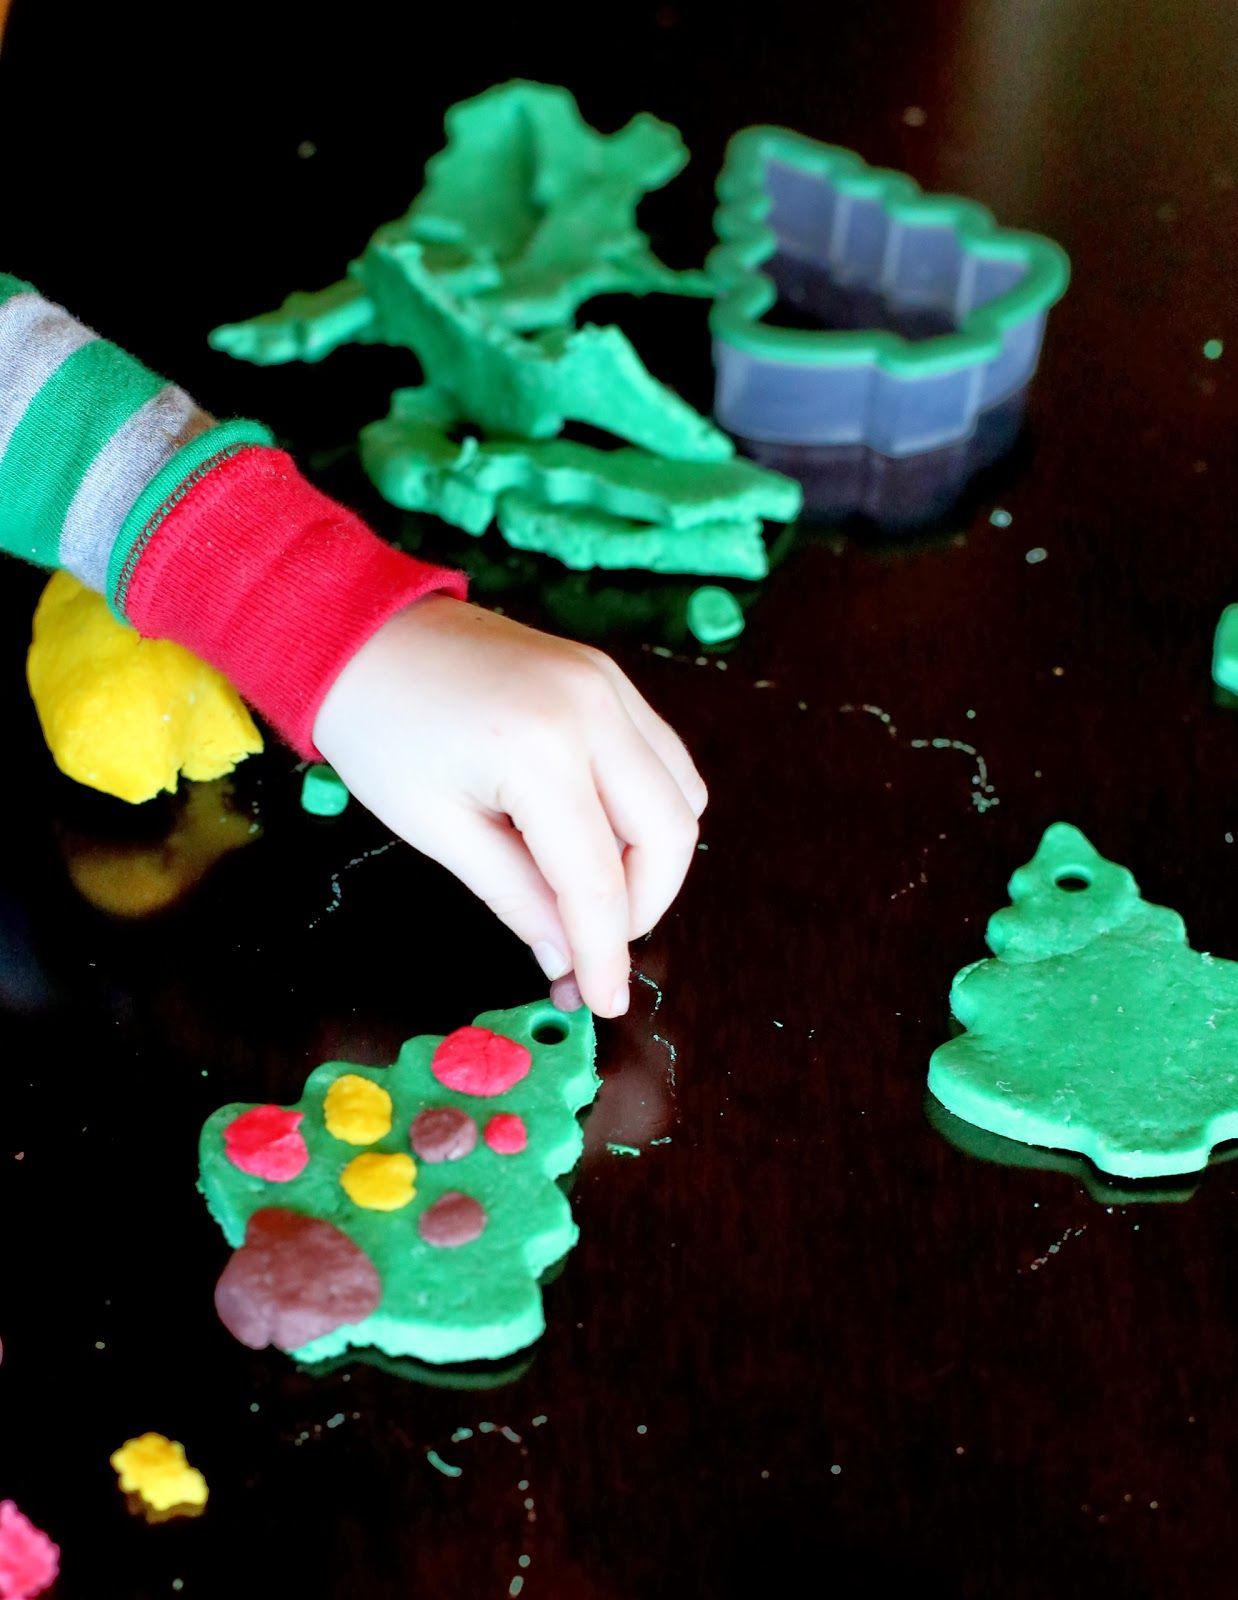 DIY Bread Clay Recipe for No Bake Ornaments | Holiday ...